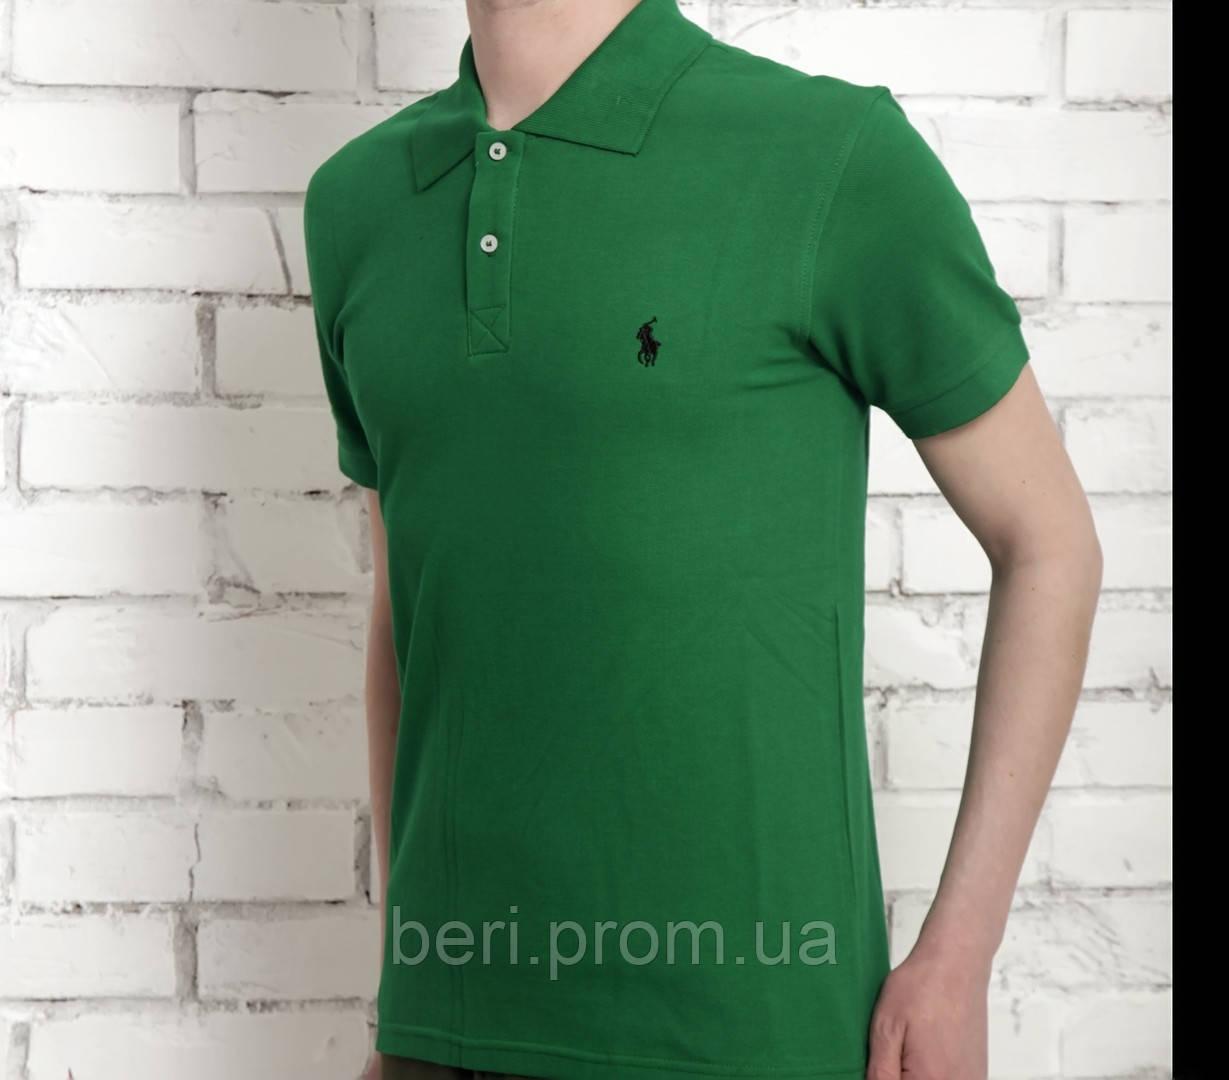 Мужская футболка тениска поло Ralph Polo Lauren | Чоловіча теніска поло Ральф Поло Лорен (Зеленый)